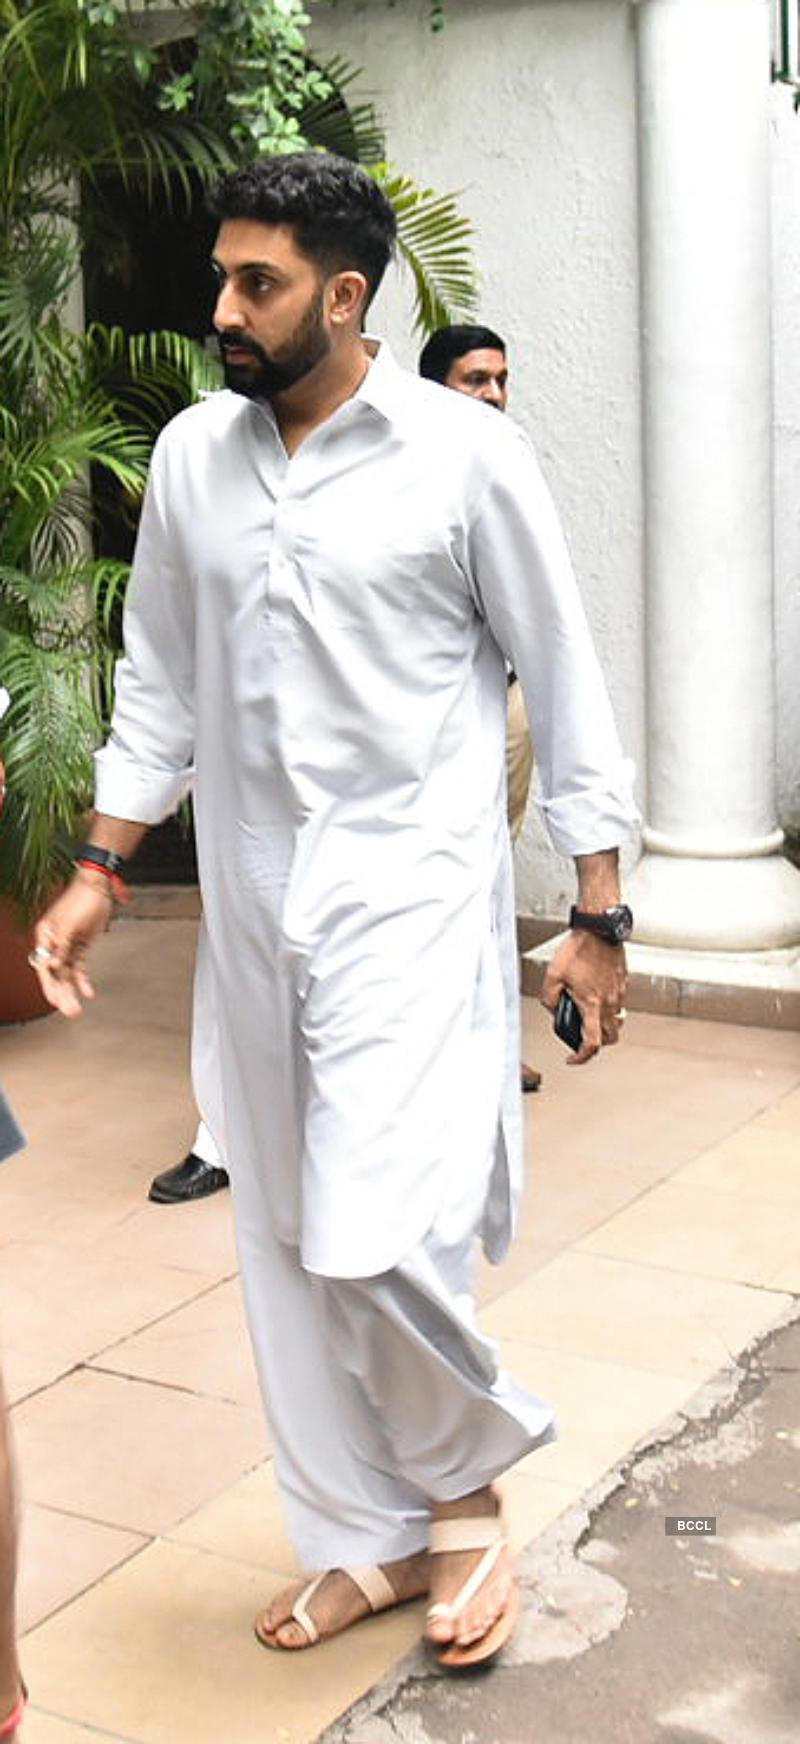 Abhishek Bachchan, Aishwarya Rai and others pay last respects to Shweta Nanda's father-in-law Rajan Nanda